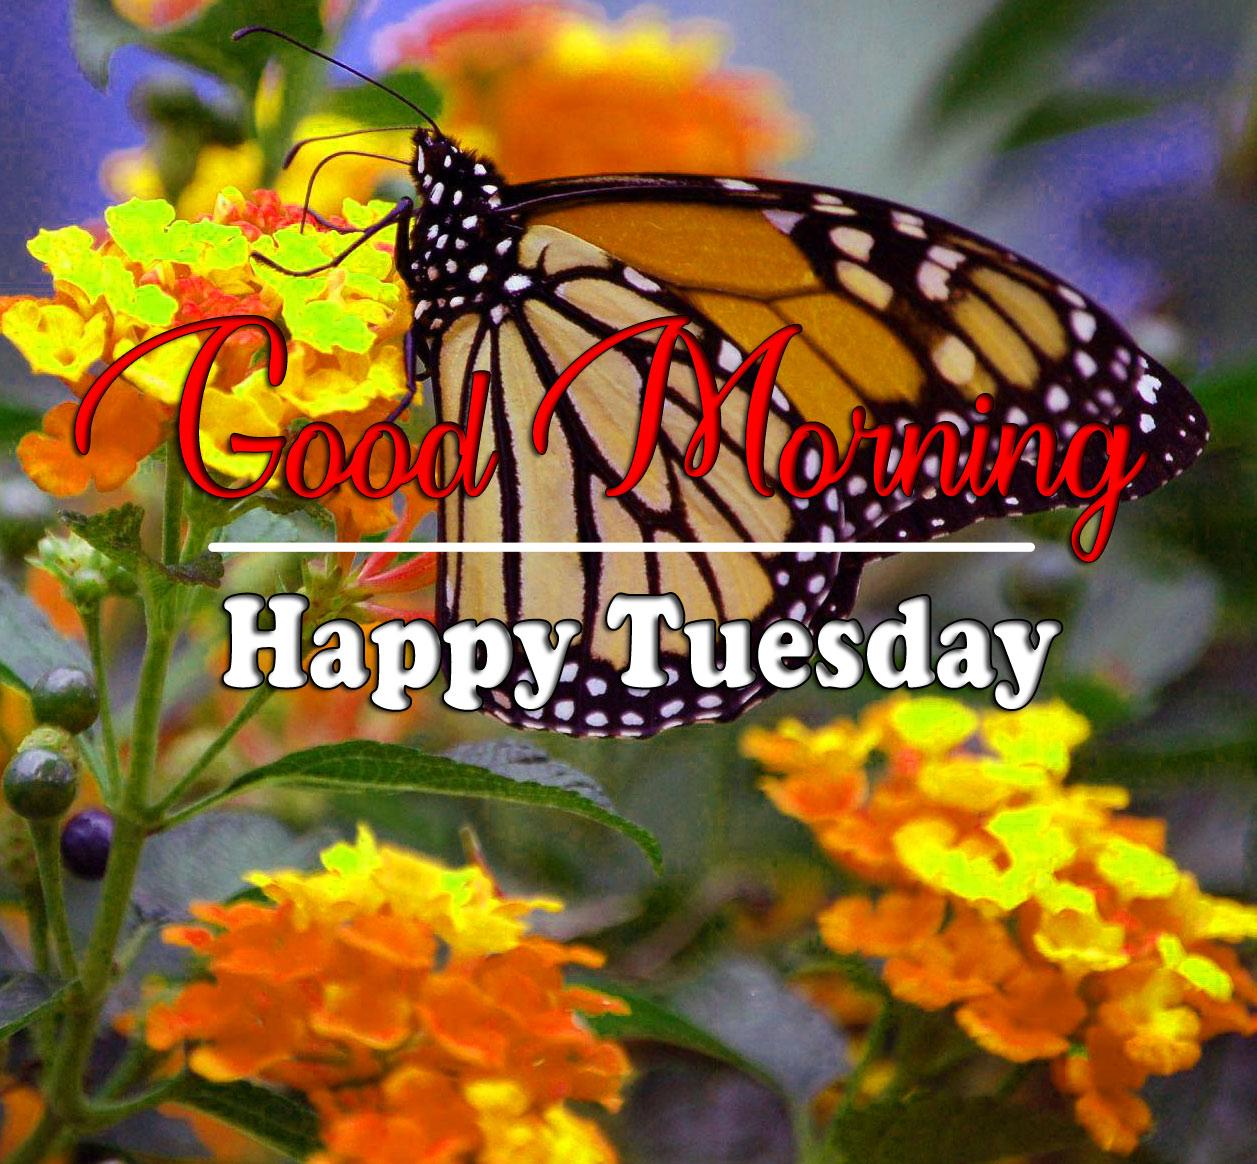 Tuesday Good morning Pics 2